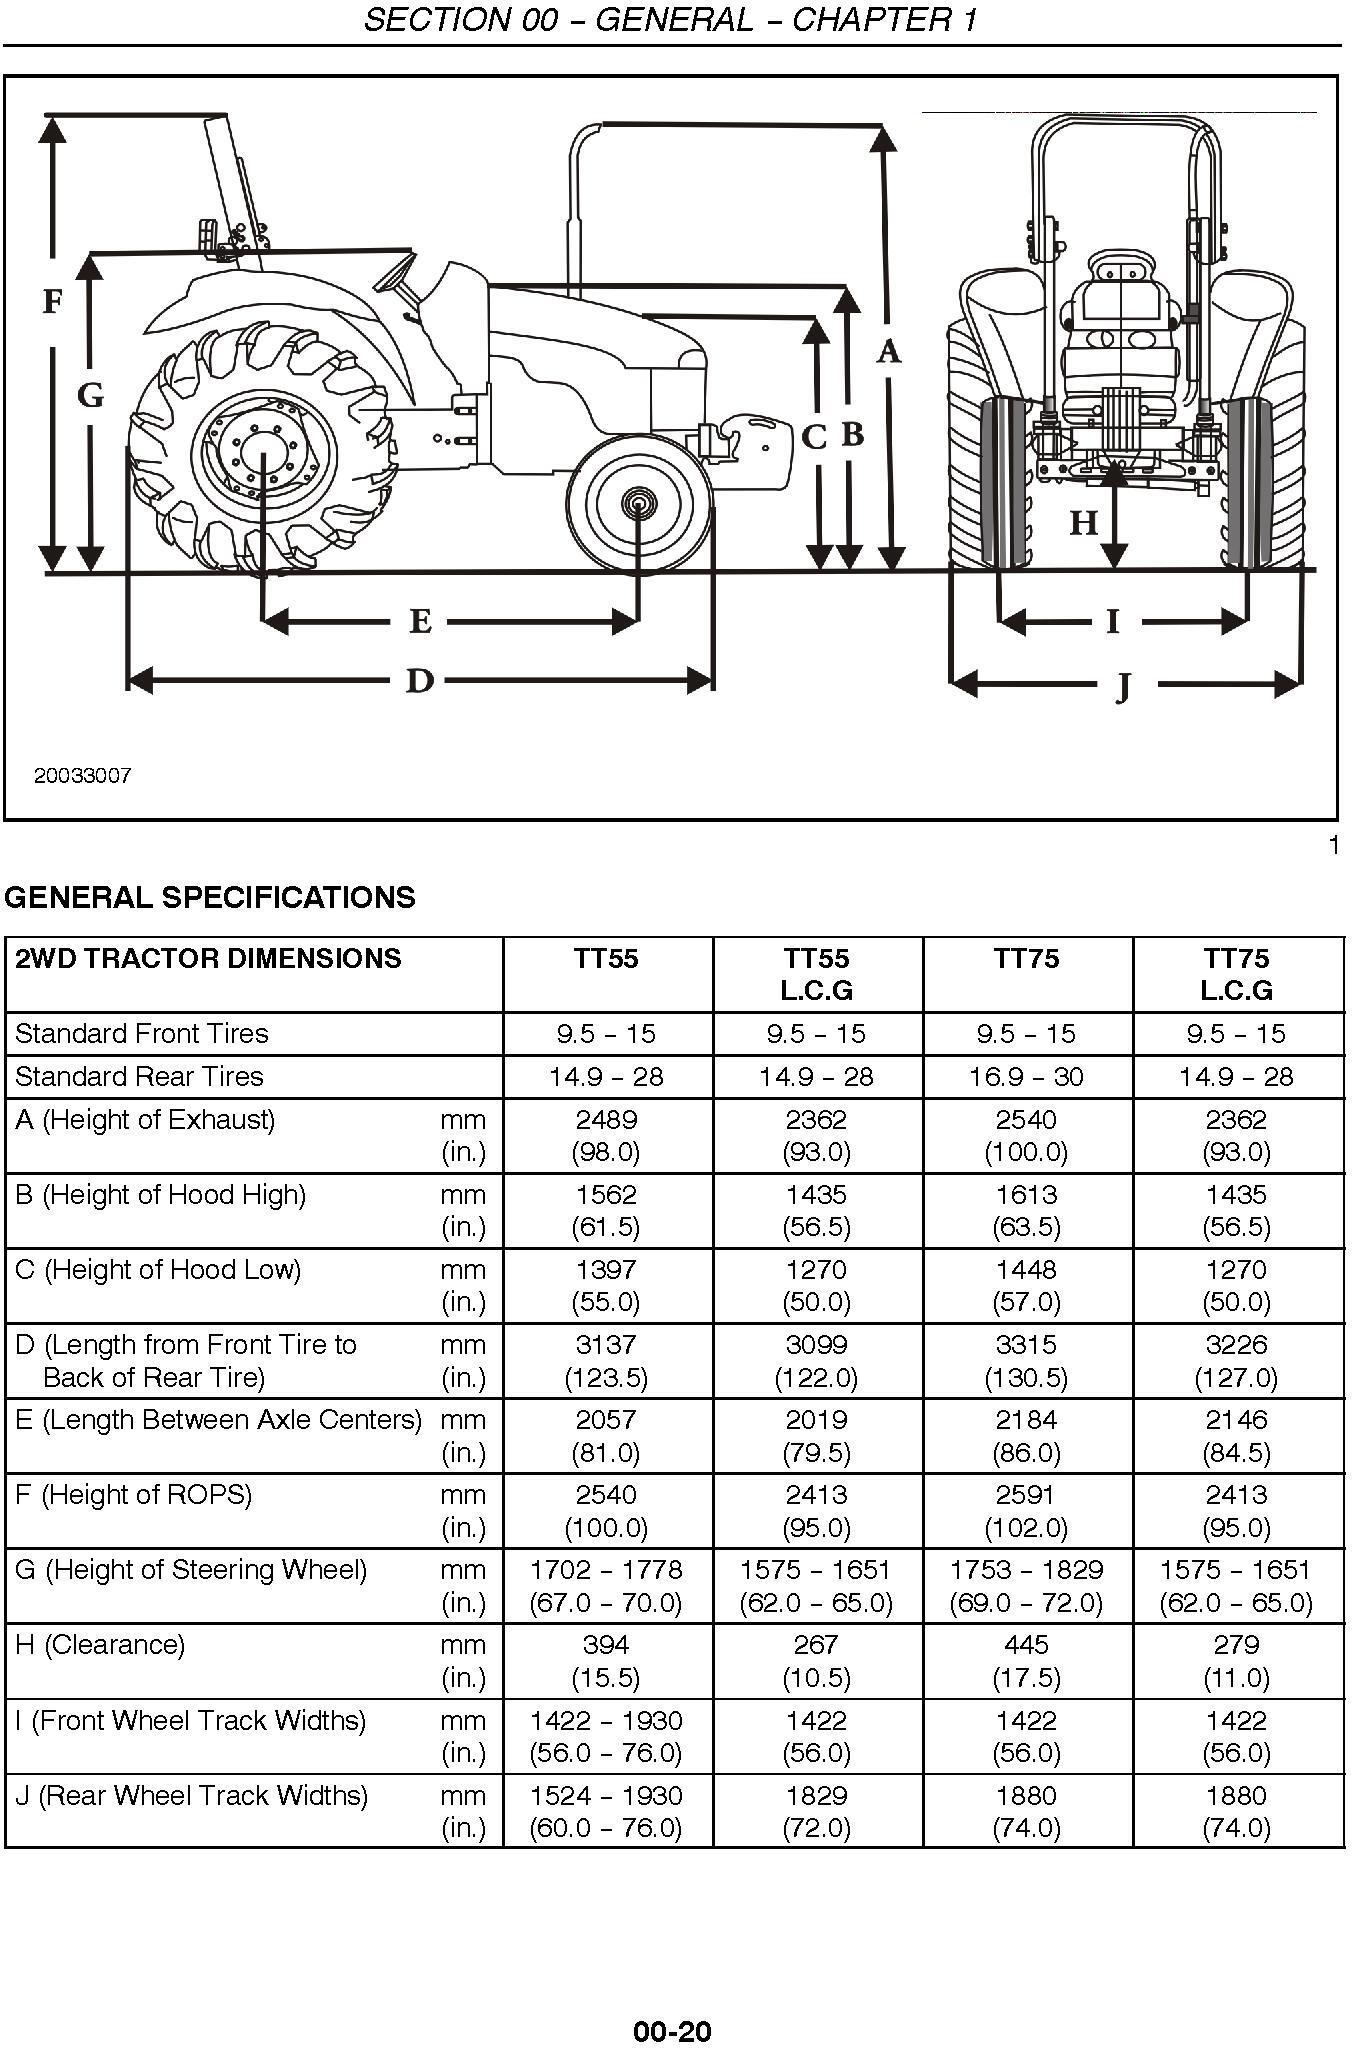 New Holland TT55, TT75 Tractor Complete Service Manual - 1